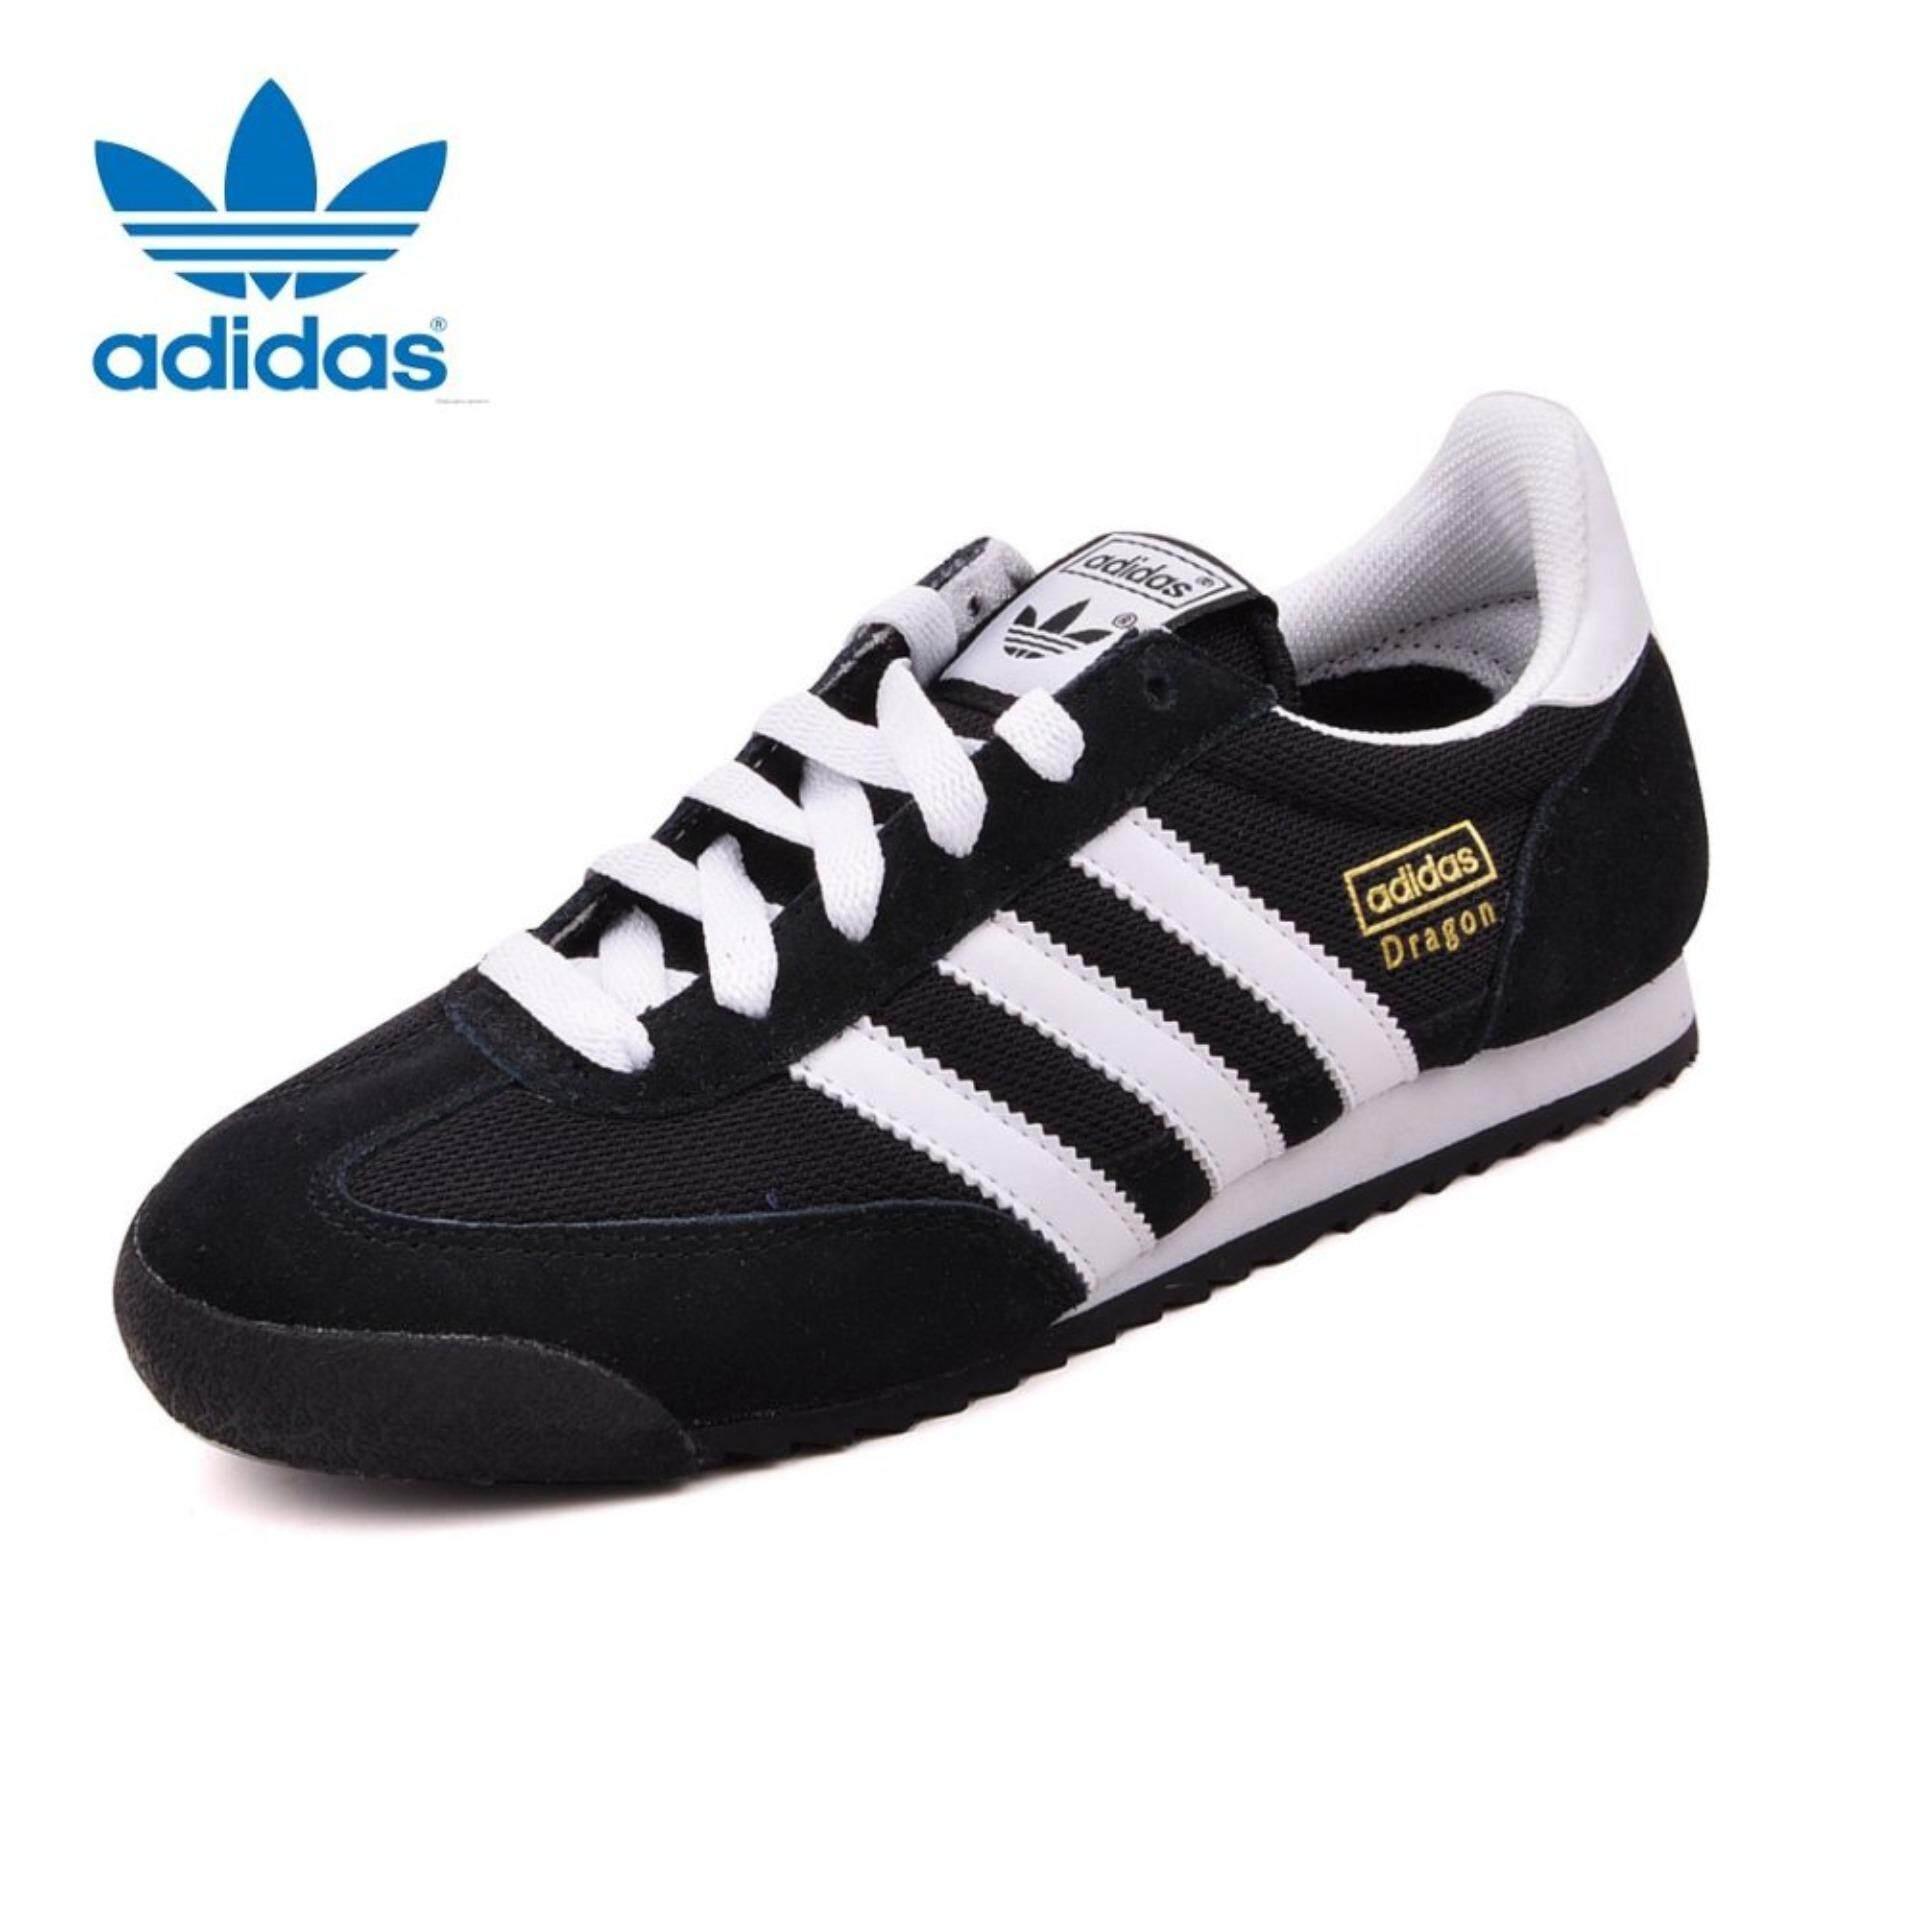 Adidas Uniseks Originals Naga Vantage Sepatu G16025 Hitam-Internasional